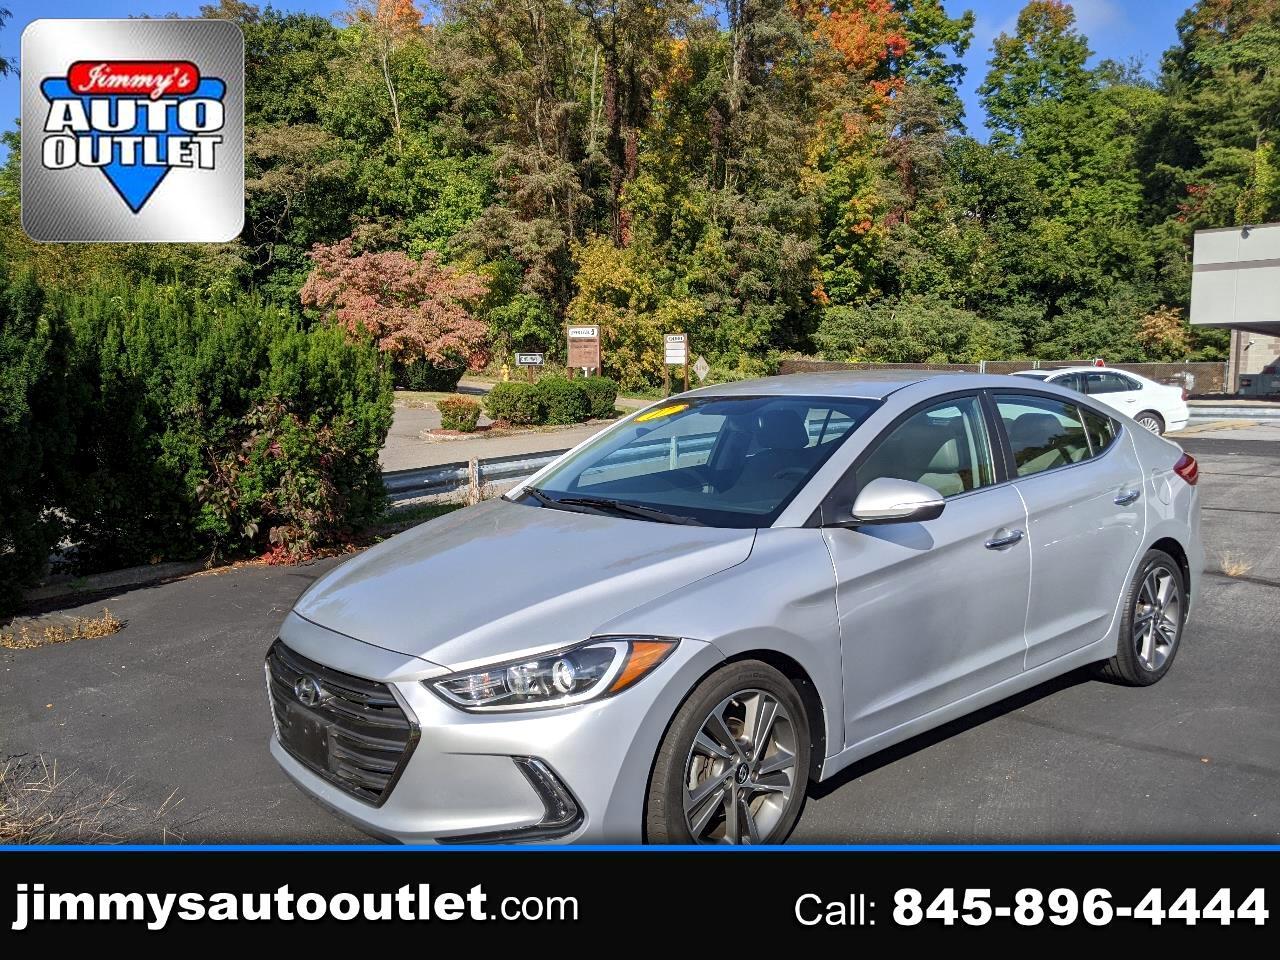 Hyundai Elantra Limited 2.0L Auto (Alabama) *Ltd Avail* 2017